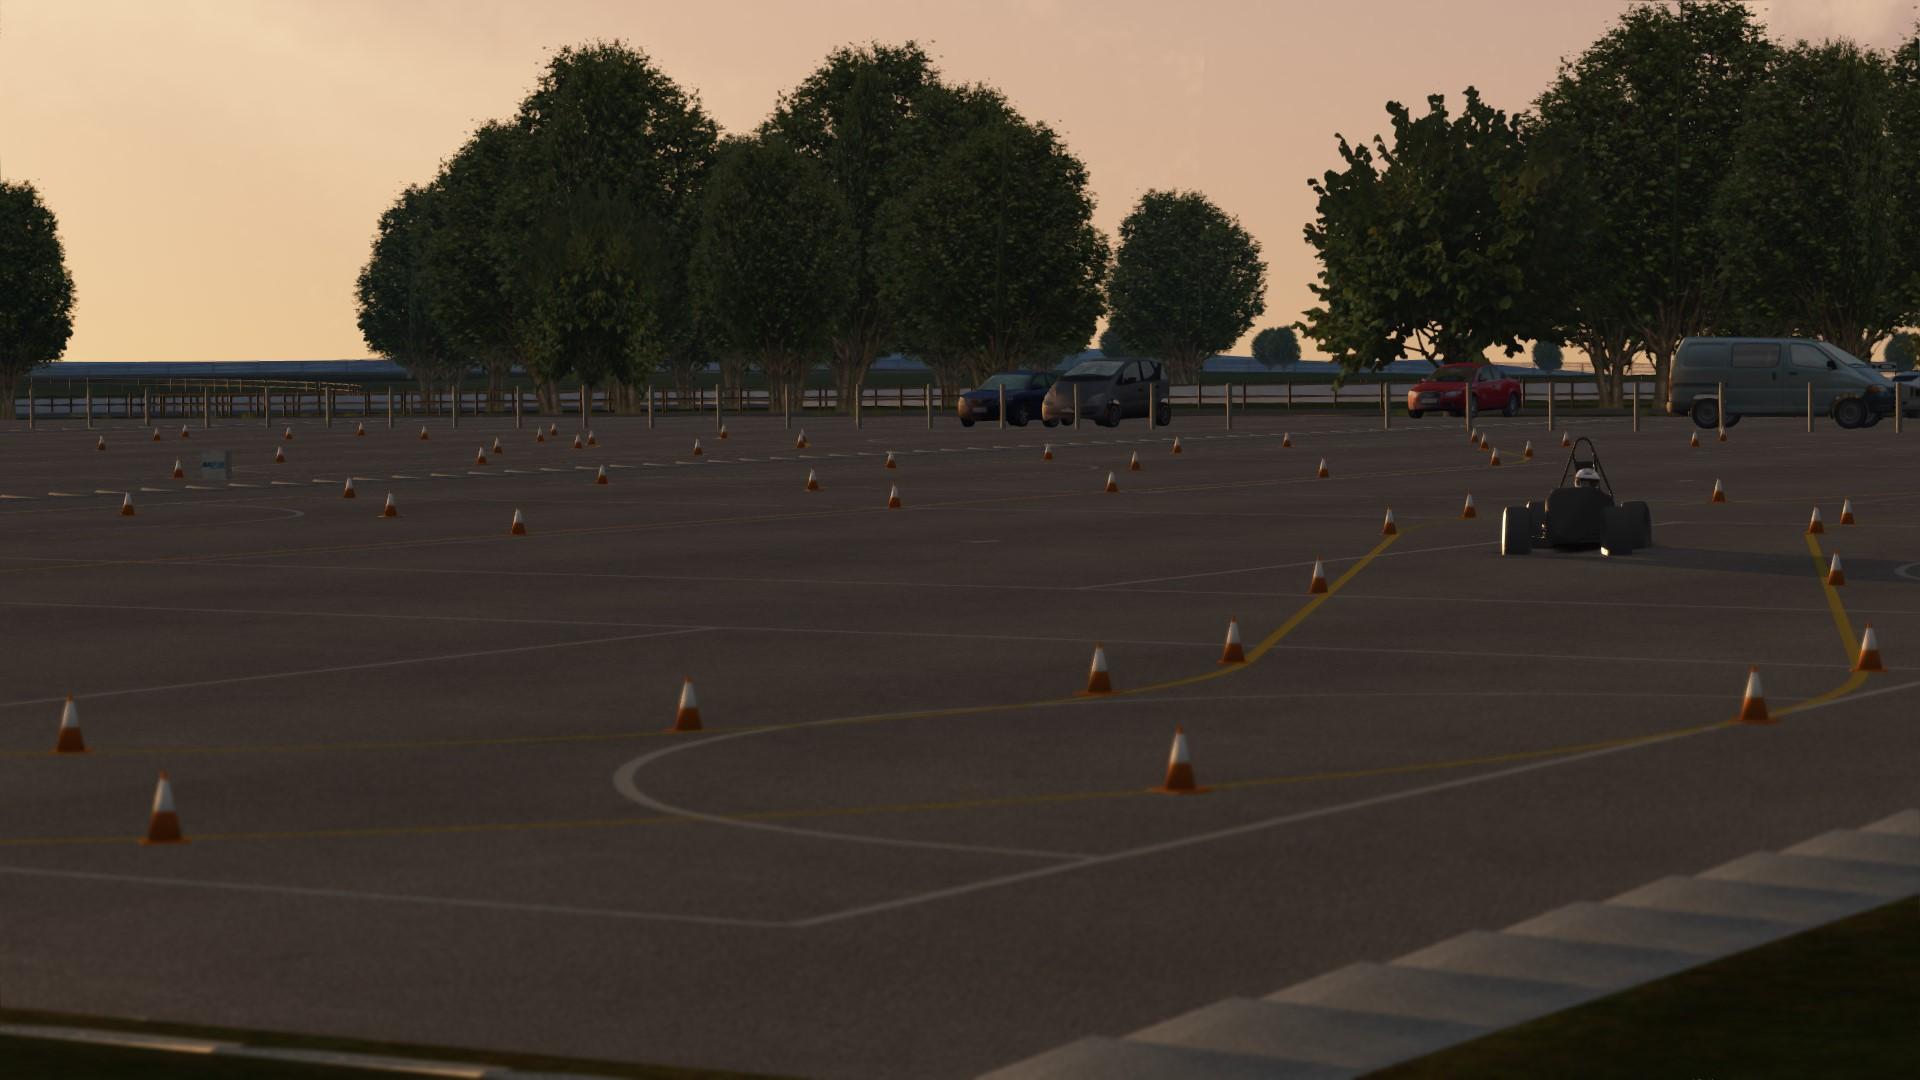 Screenshot_r15e_netball_courts_tom1_9-10-117-14-23-9.jpg